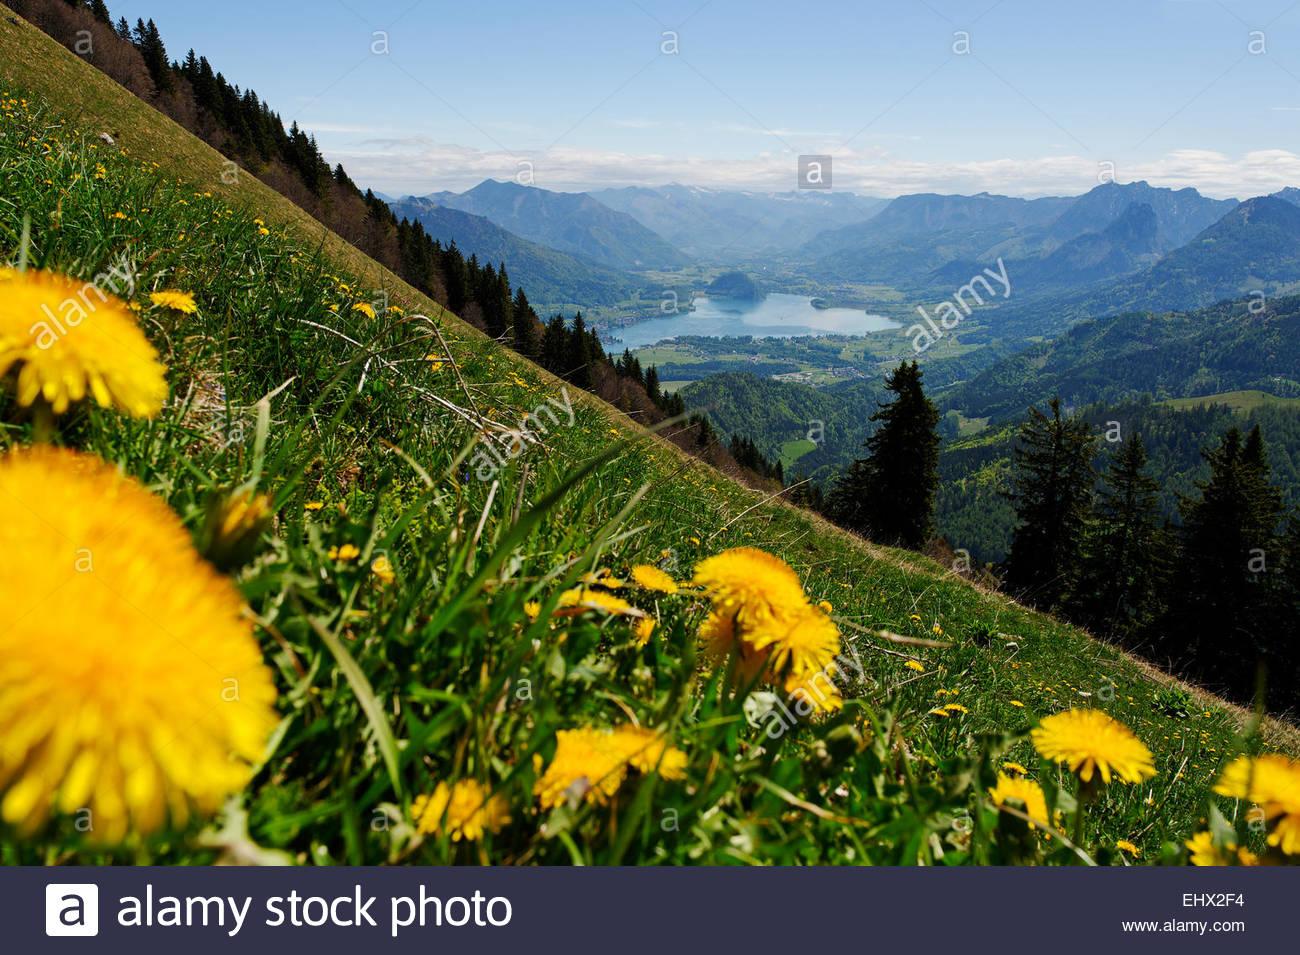 Austria, Salzburg State, View from Zwoelferhorn near Sankt Gilgen to Lake Wolfgangsee and Hoellen Mountains - Stock Image